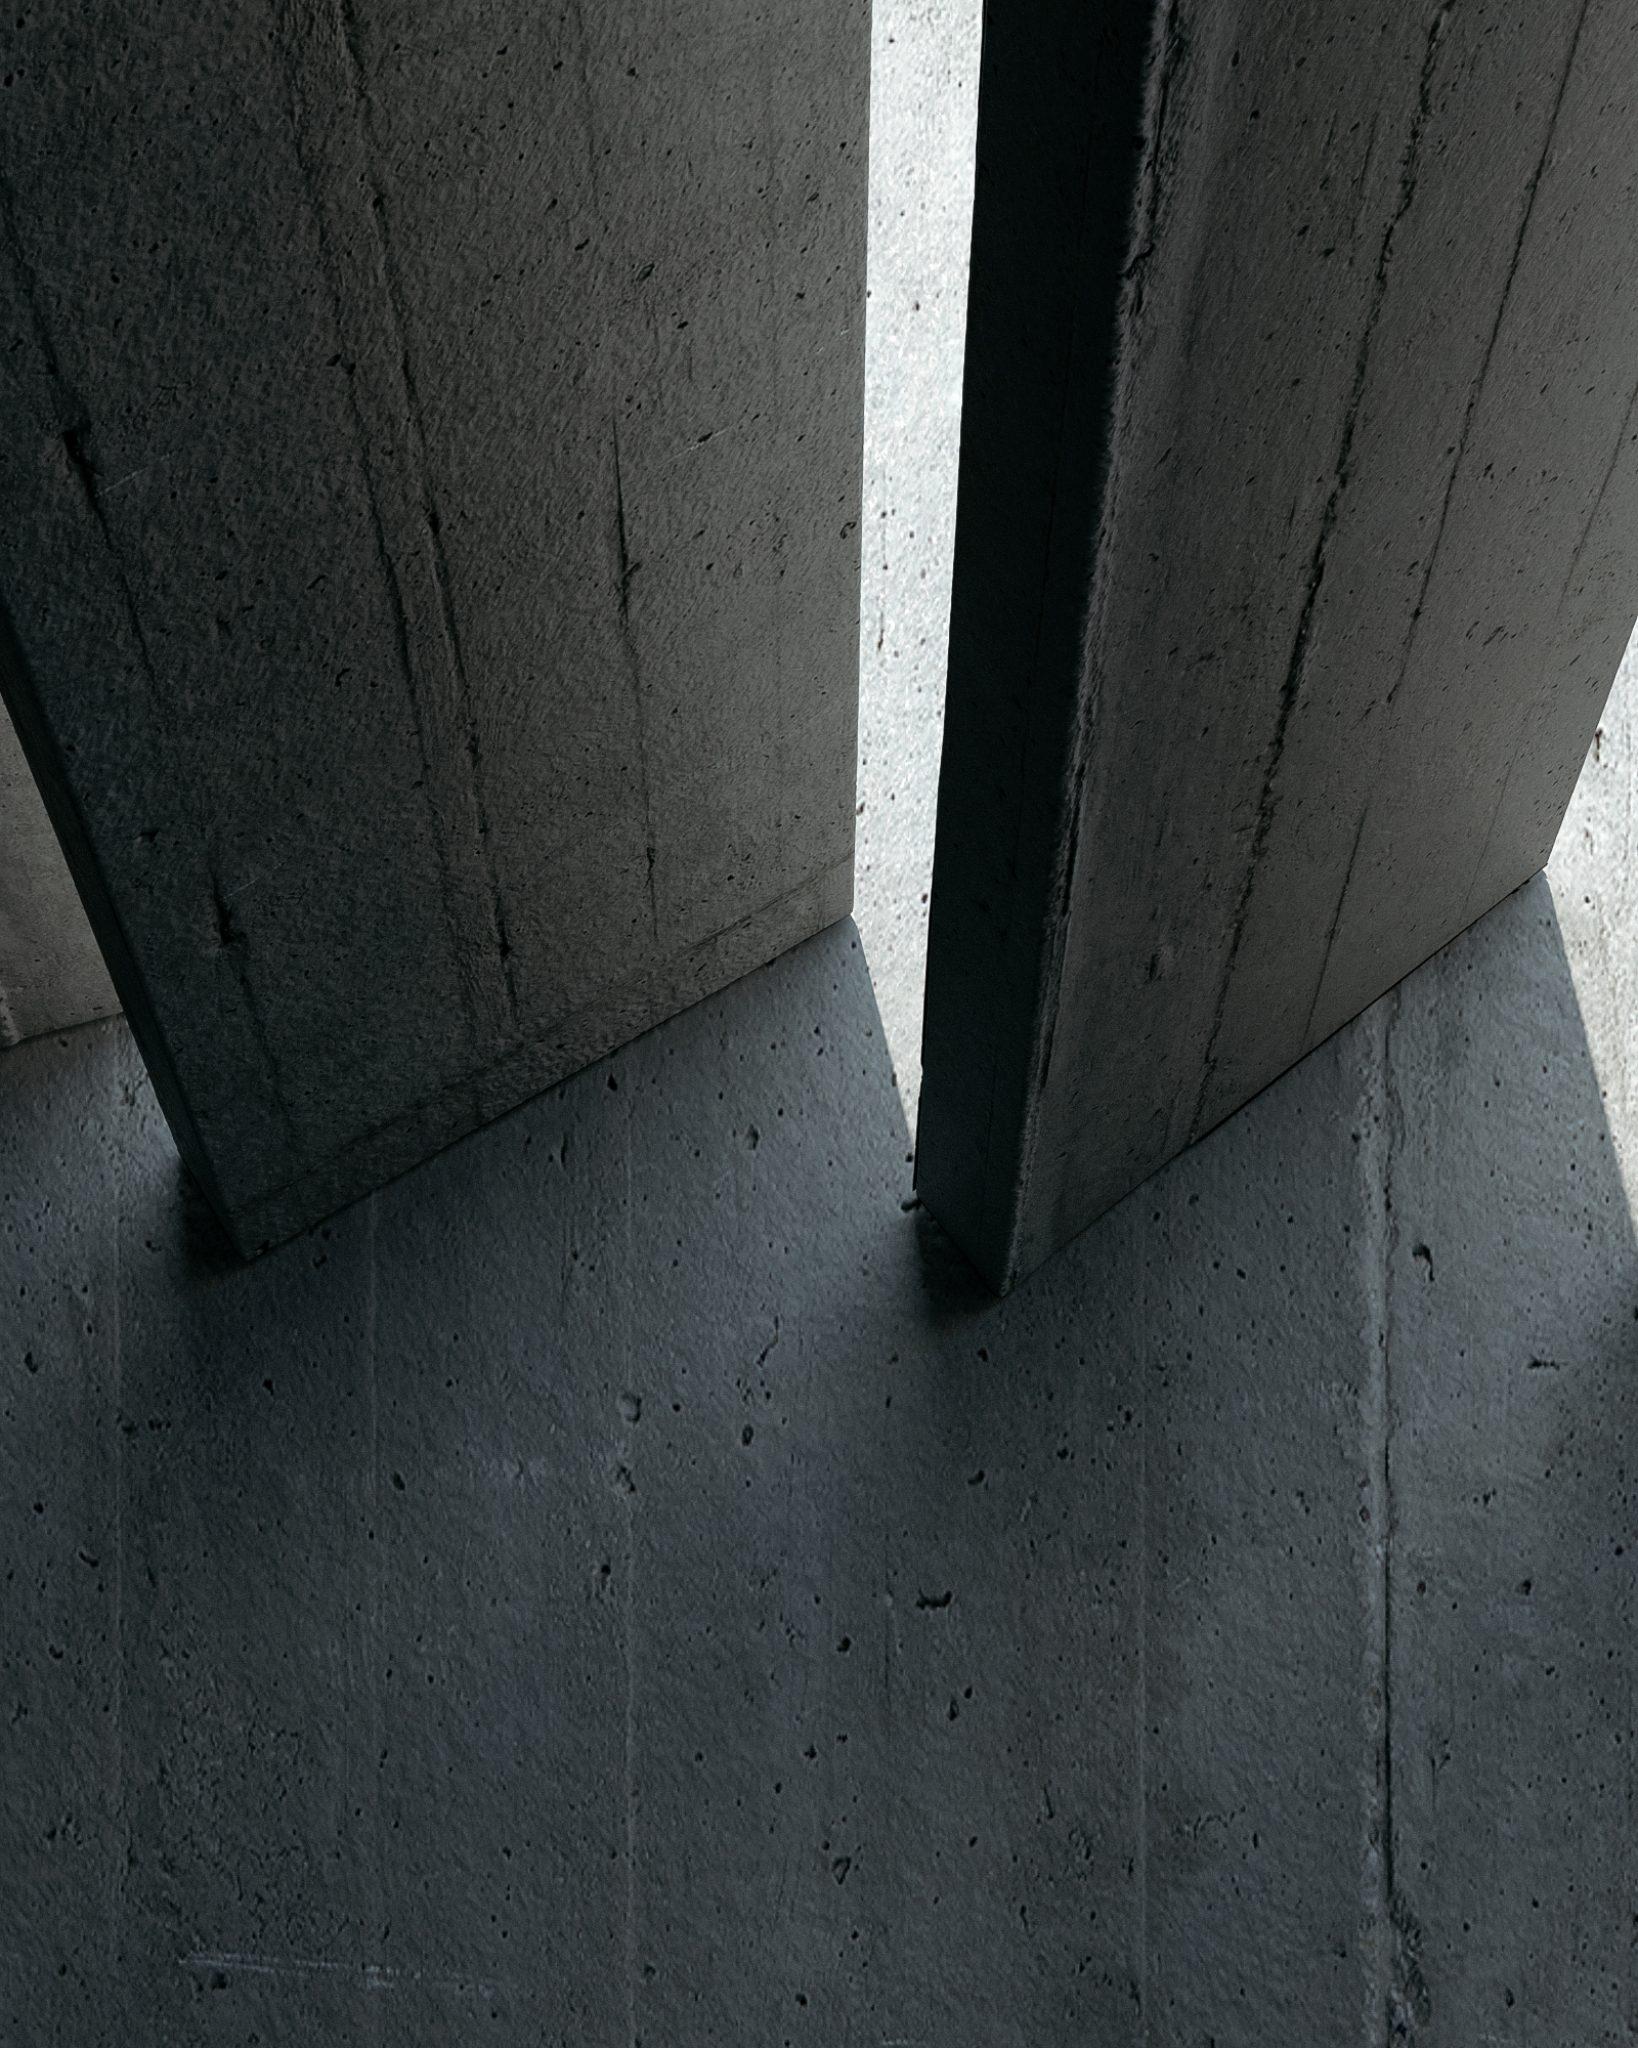 ignant-tesla-cybertruck-cgi-brutalism-cgi-editorial-4-1638×2048